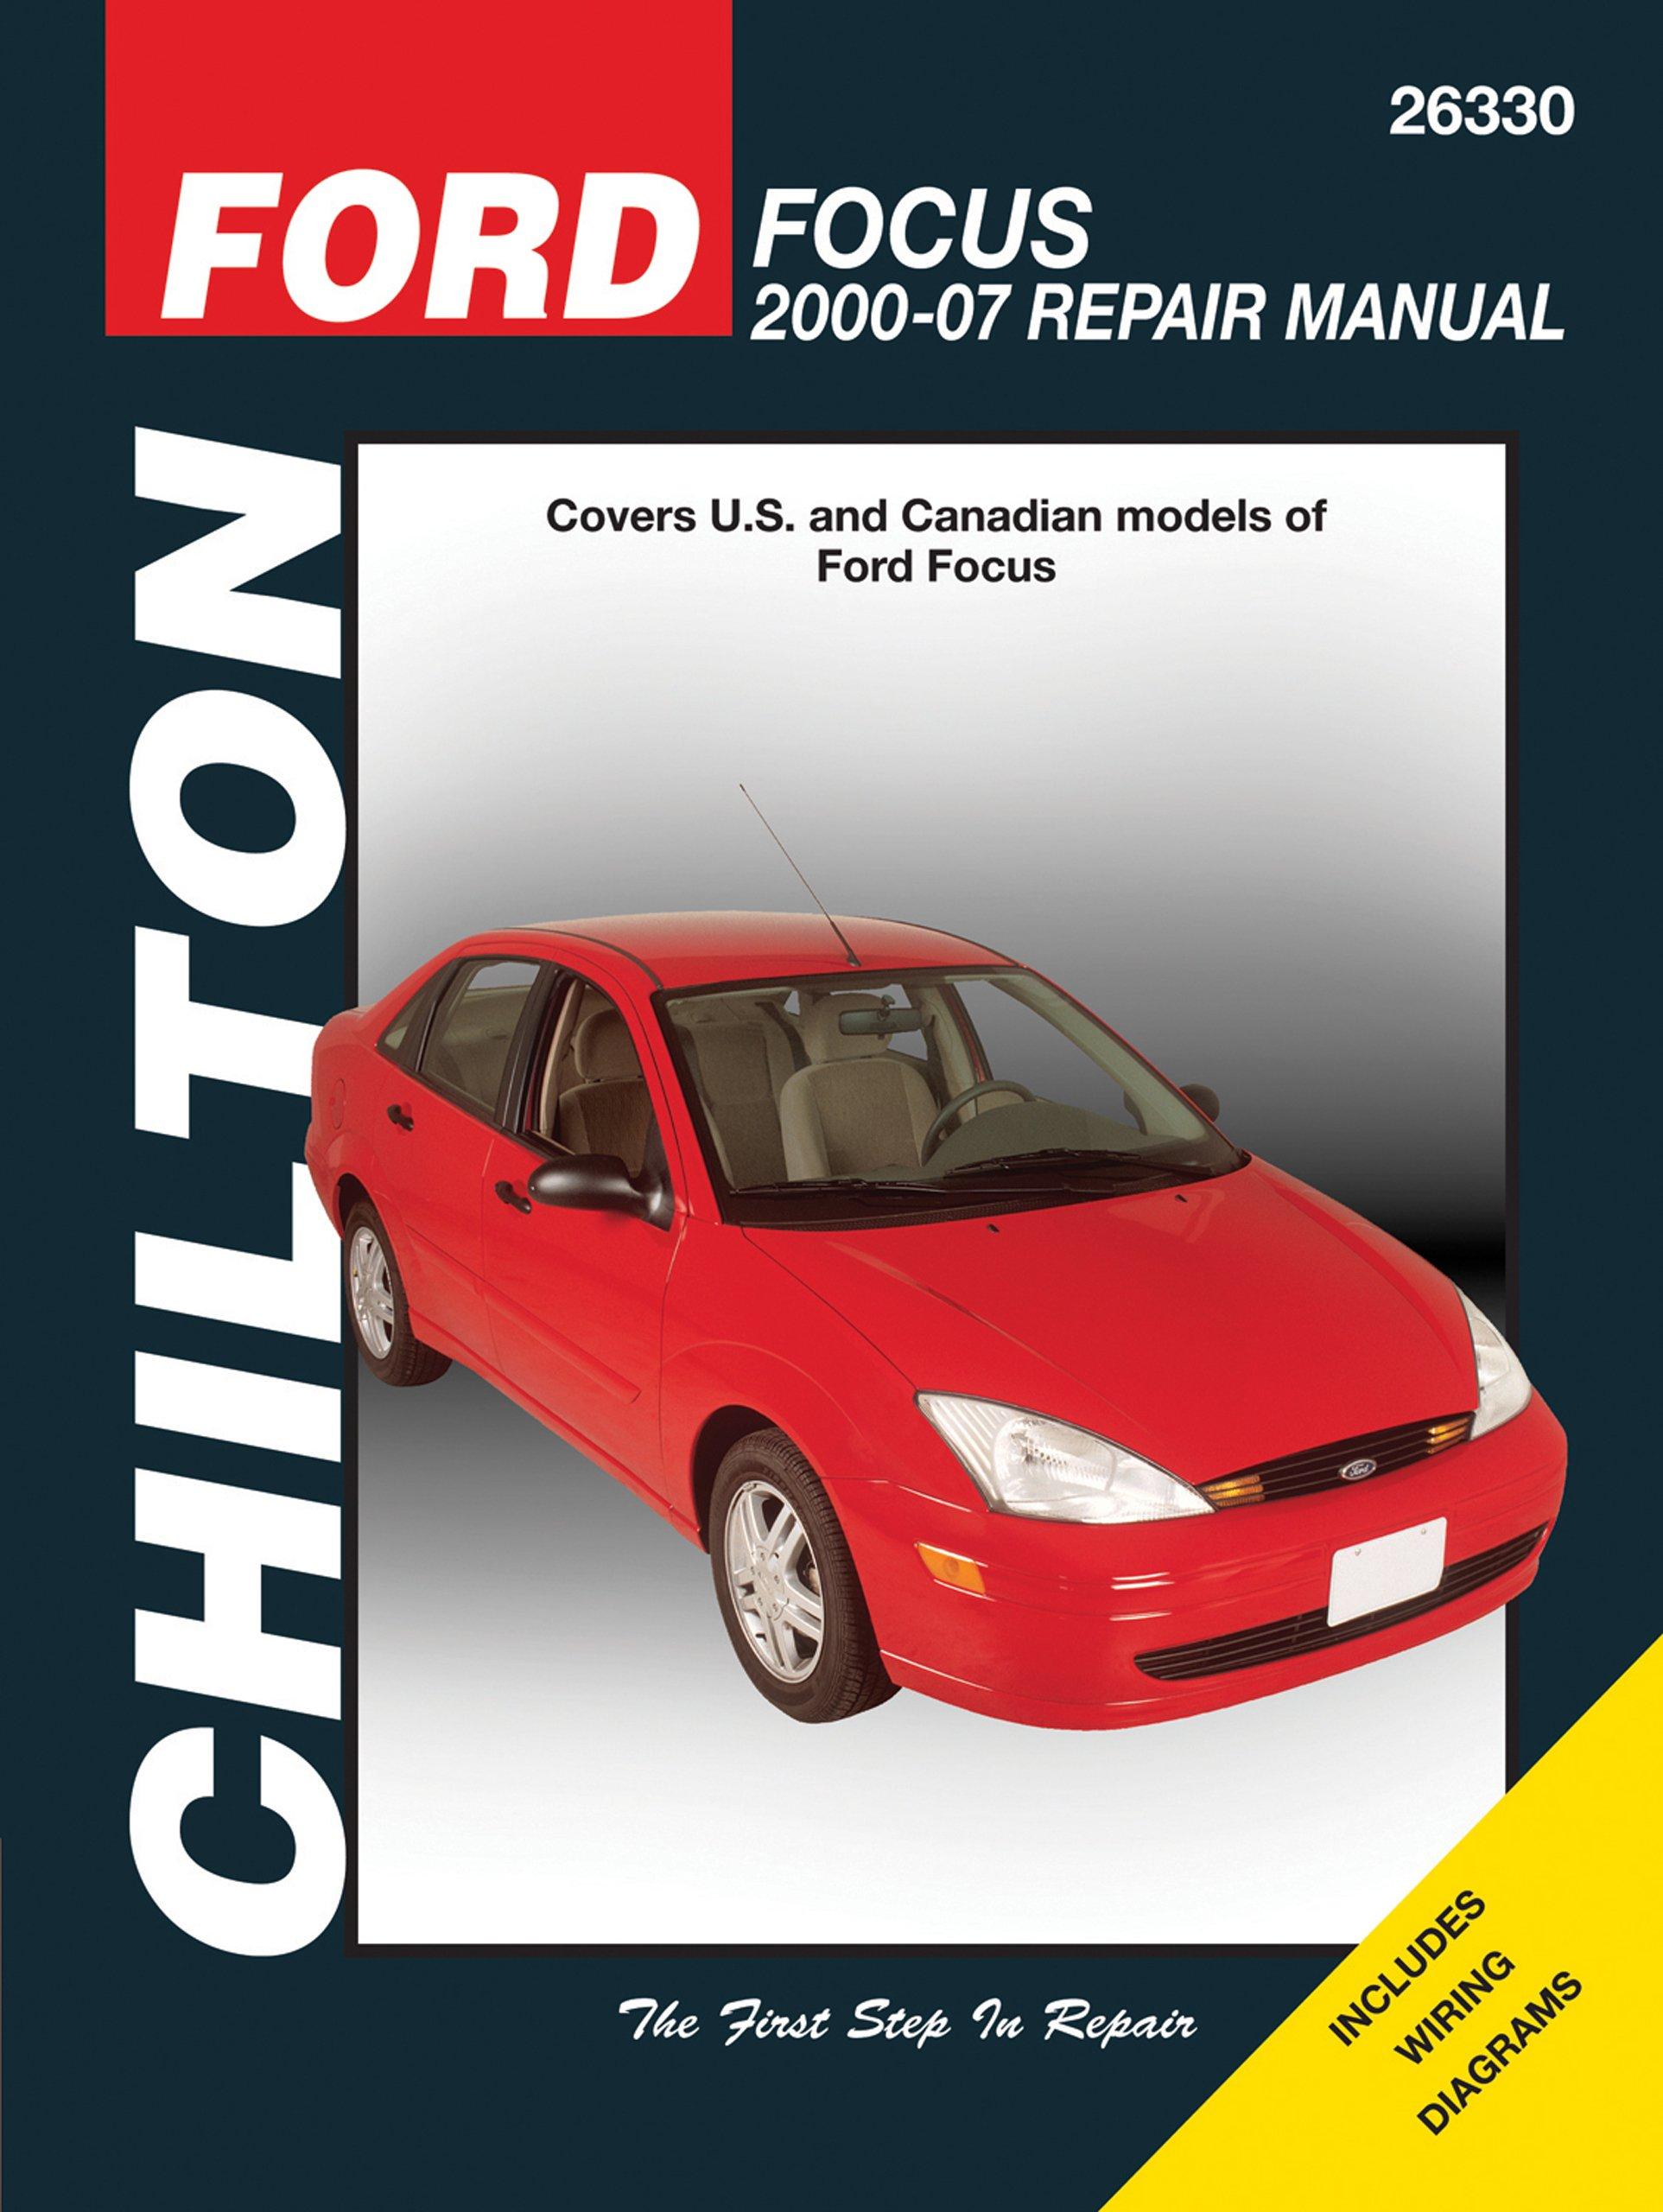 Ford Focus Automotive Repair Manual (Chilton): 00-07 (Haynes Automotive Repair  Manuals): Amazon.co.uk: Jay Storer: 9781563927850: Books